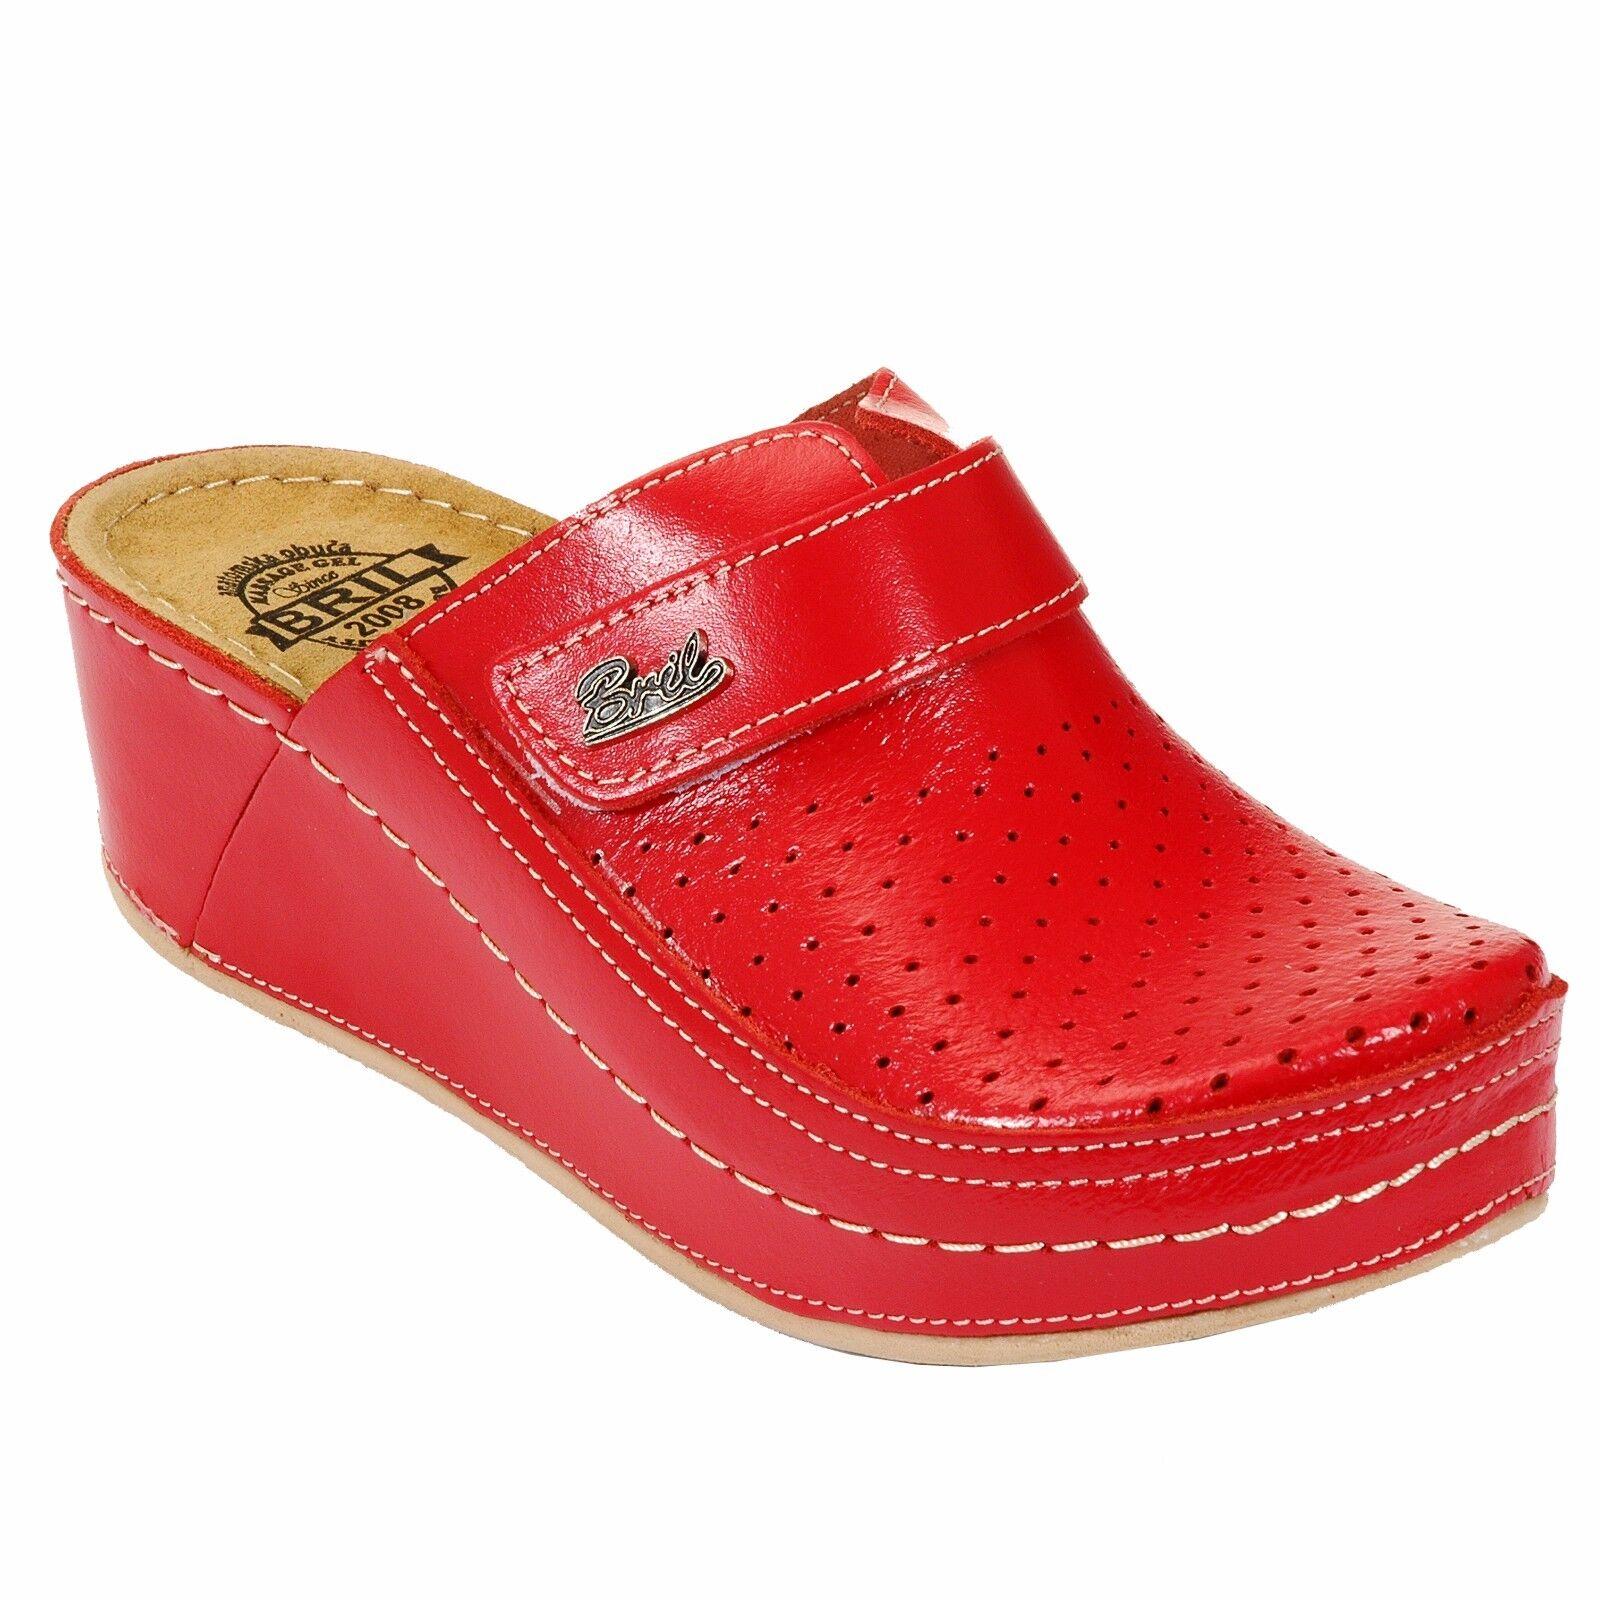 DR PUNTO ROSSO ECO IN PELLE DONNA D130 Scarpe, Slip On Clogs Pantofole Scarpe, D130 Rosso 5cd1fc